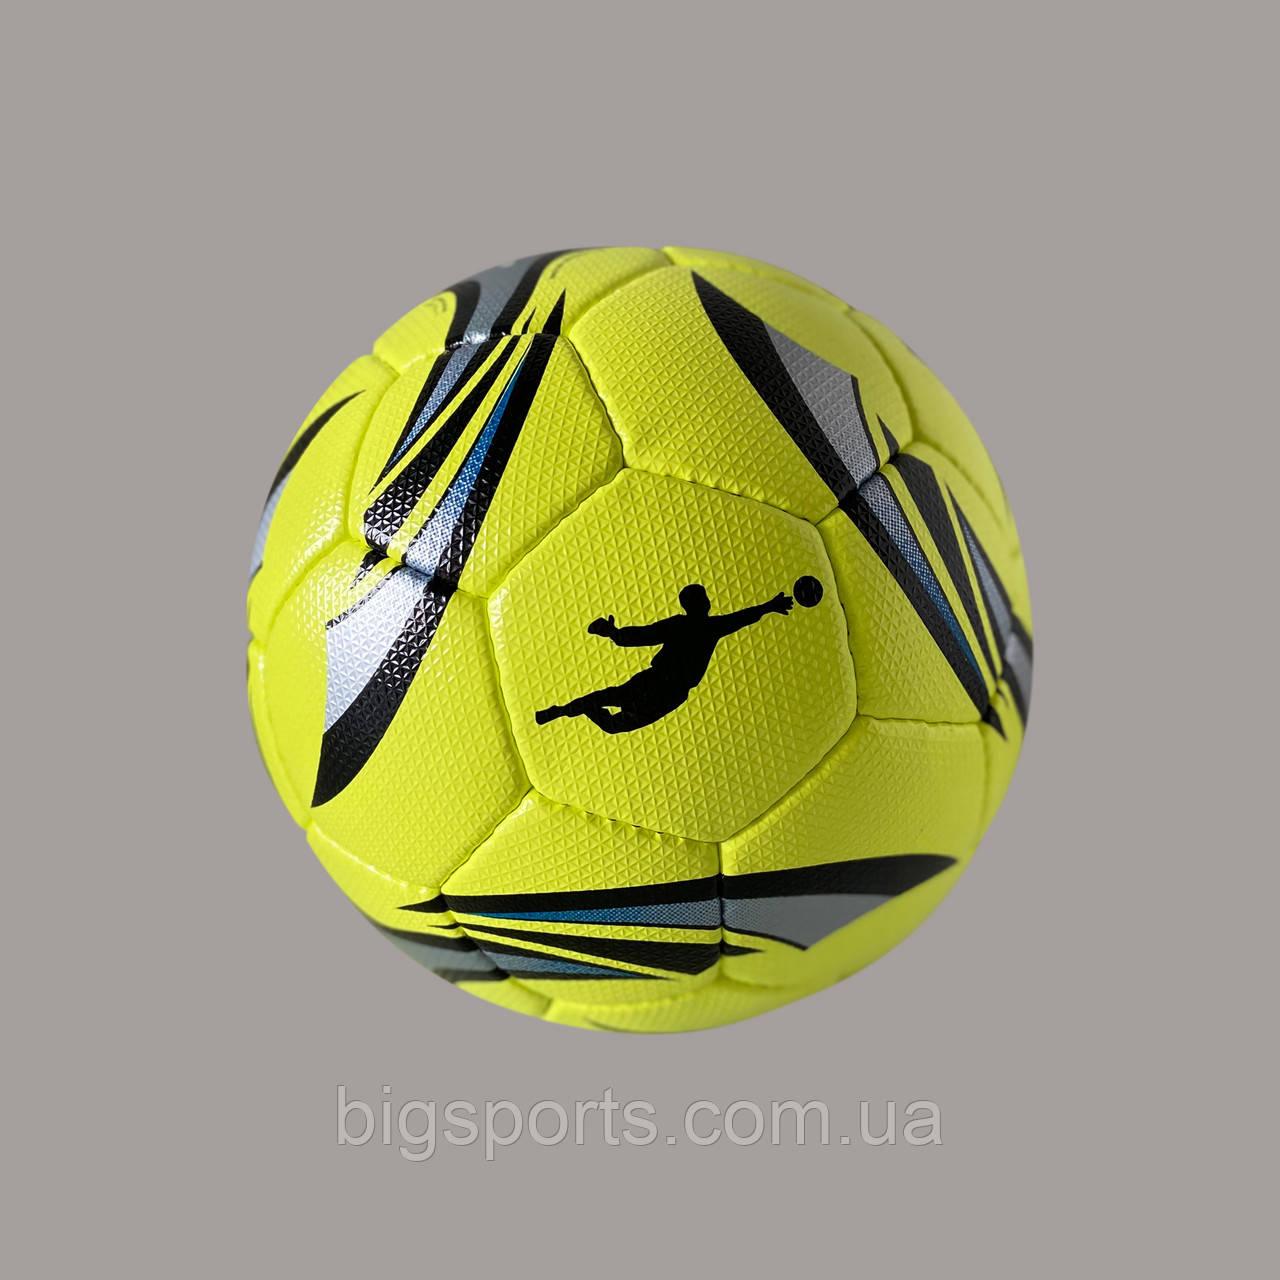 Мяч футбольный Brave GK Equipment